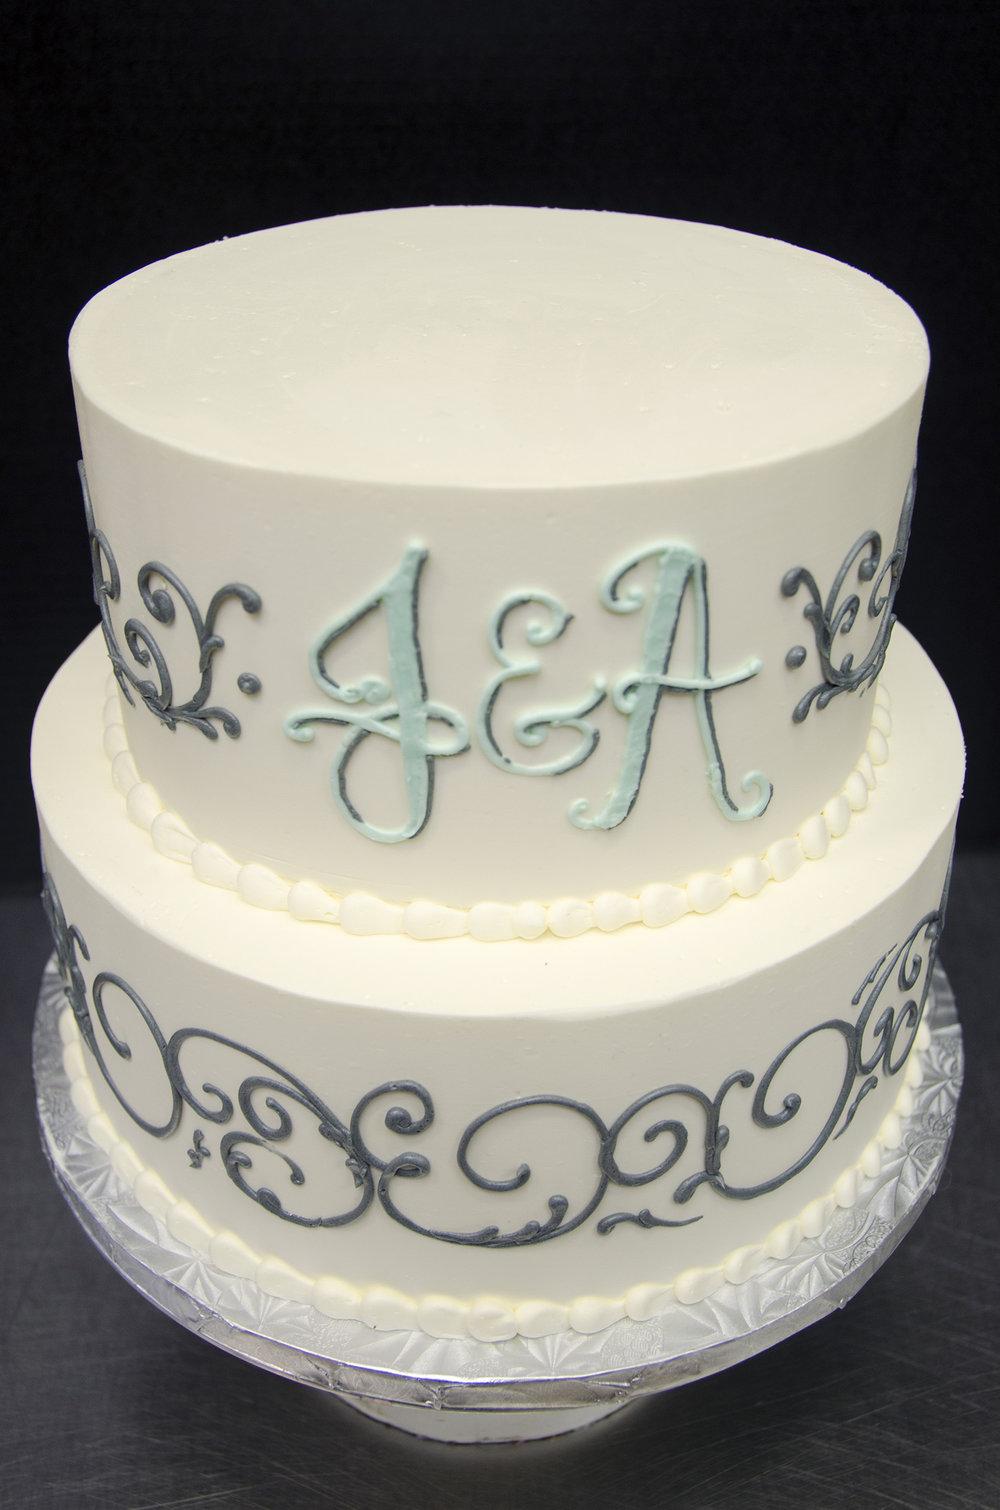 monogram cake 6.jpg